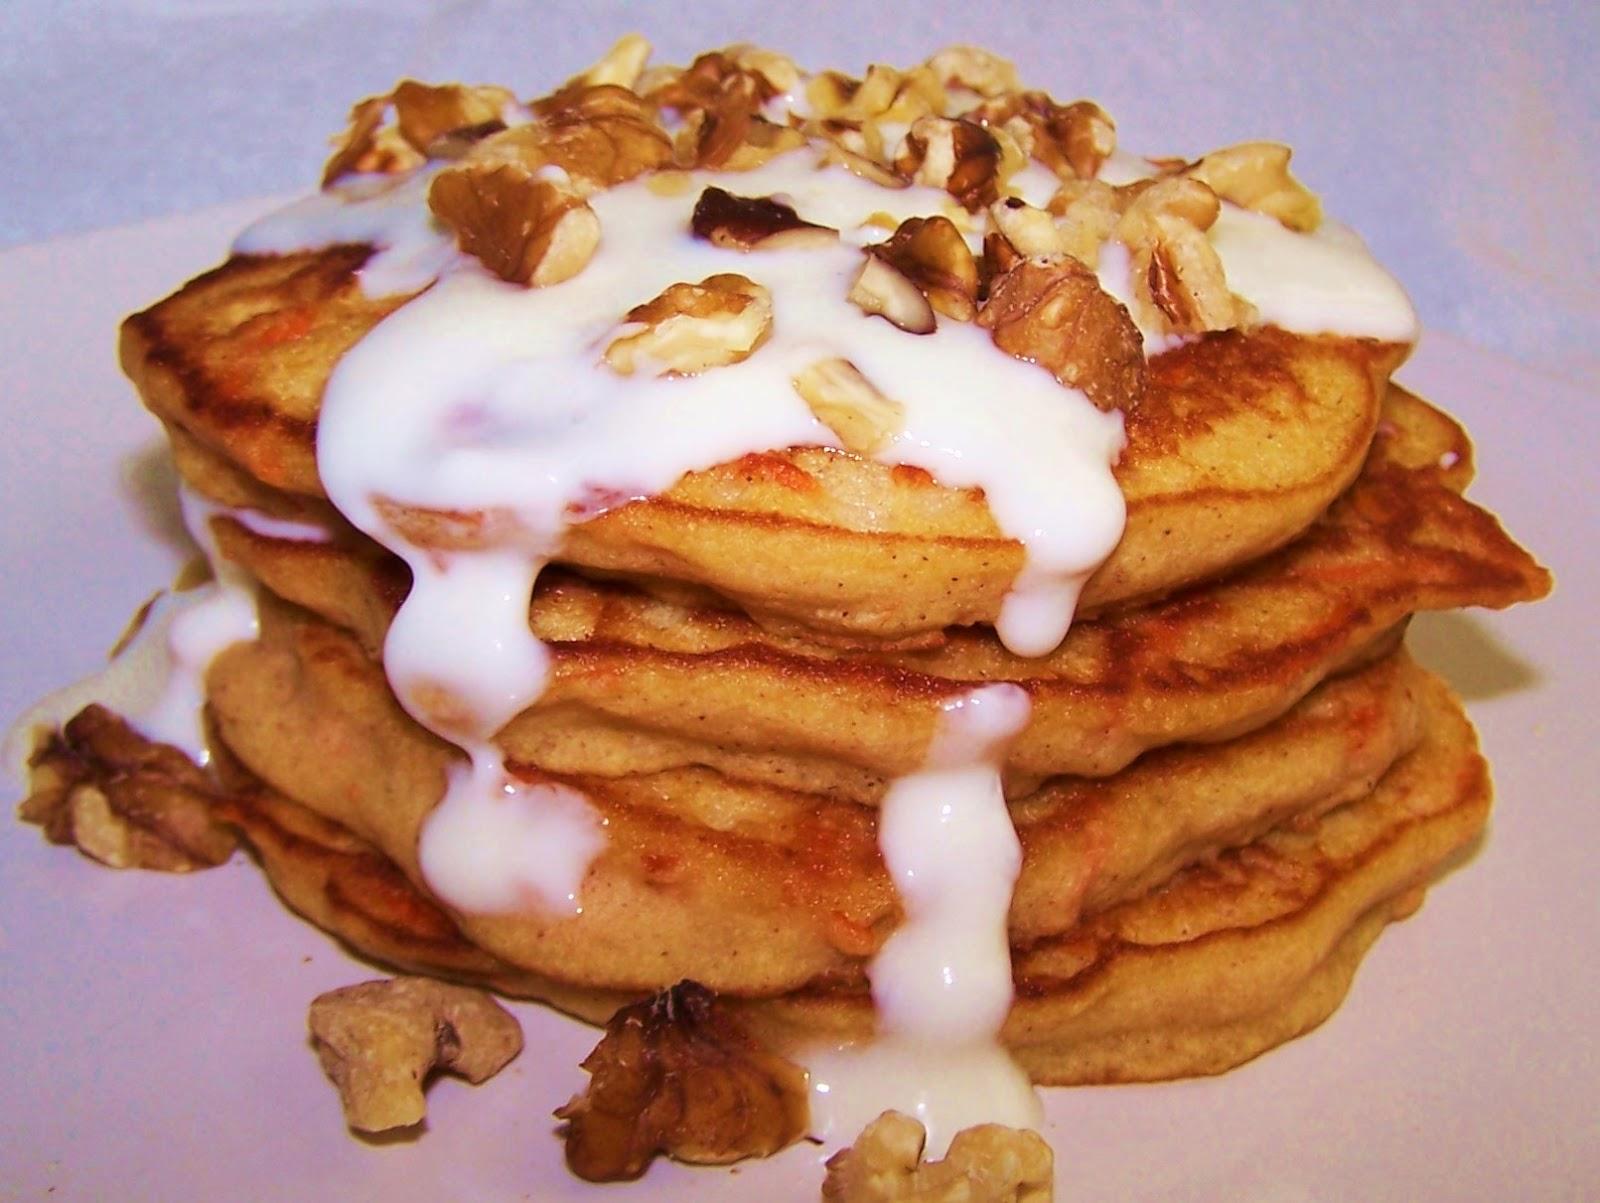 EZ Gluten Free: Gluten Free Carrot Cake Pancakes